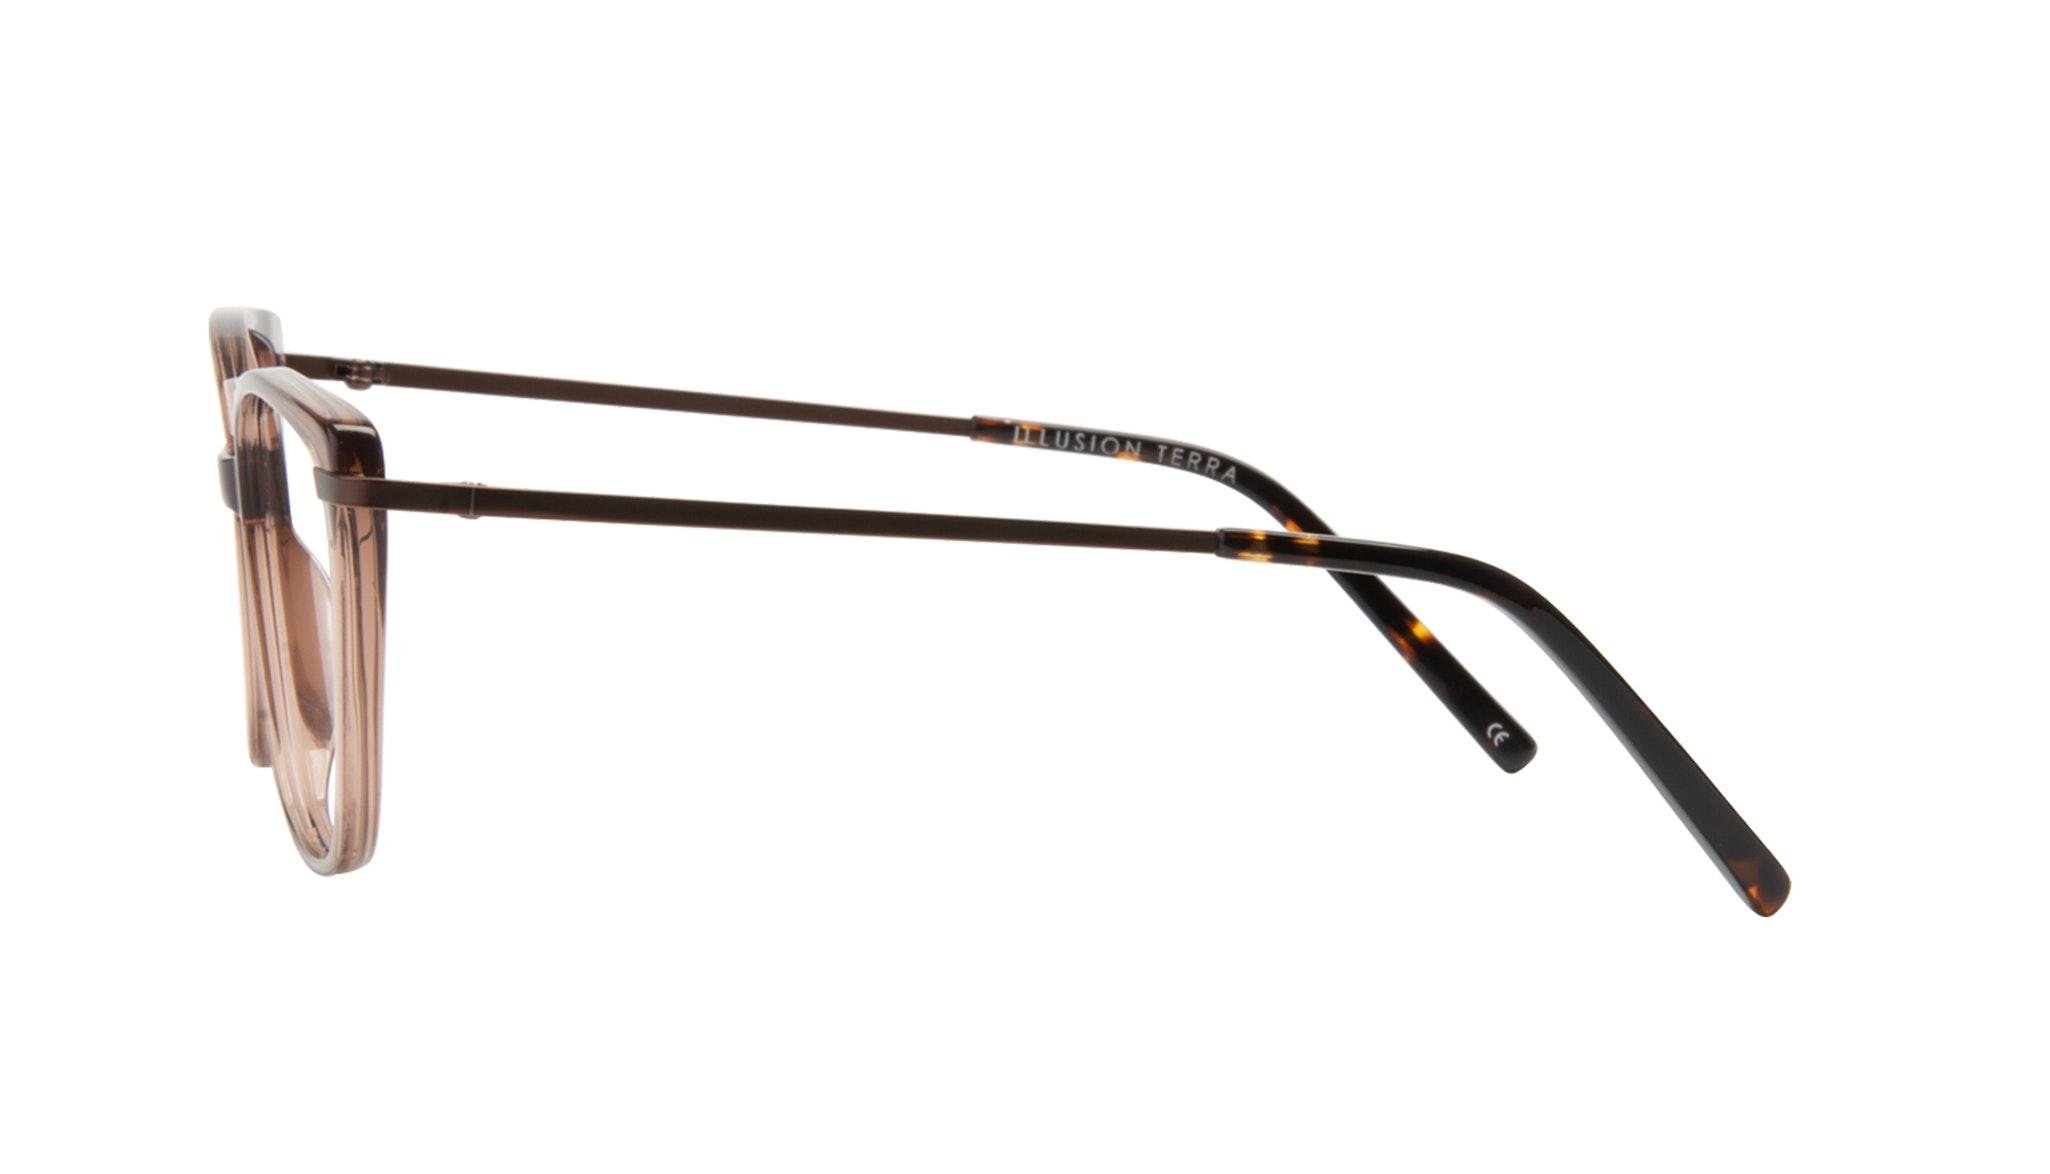 Affordable Fashion Glasses Cat Eye Rectangle Square Eyeglasses Women Illusion Terra Side